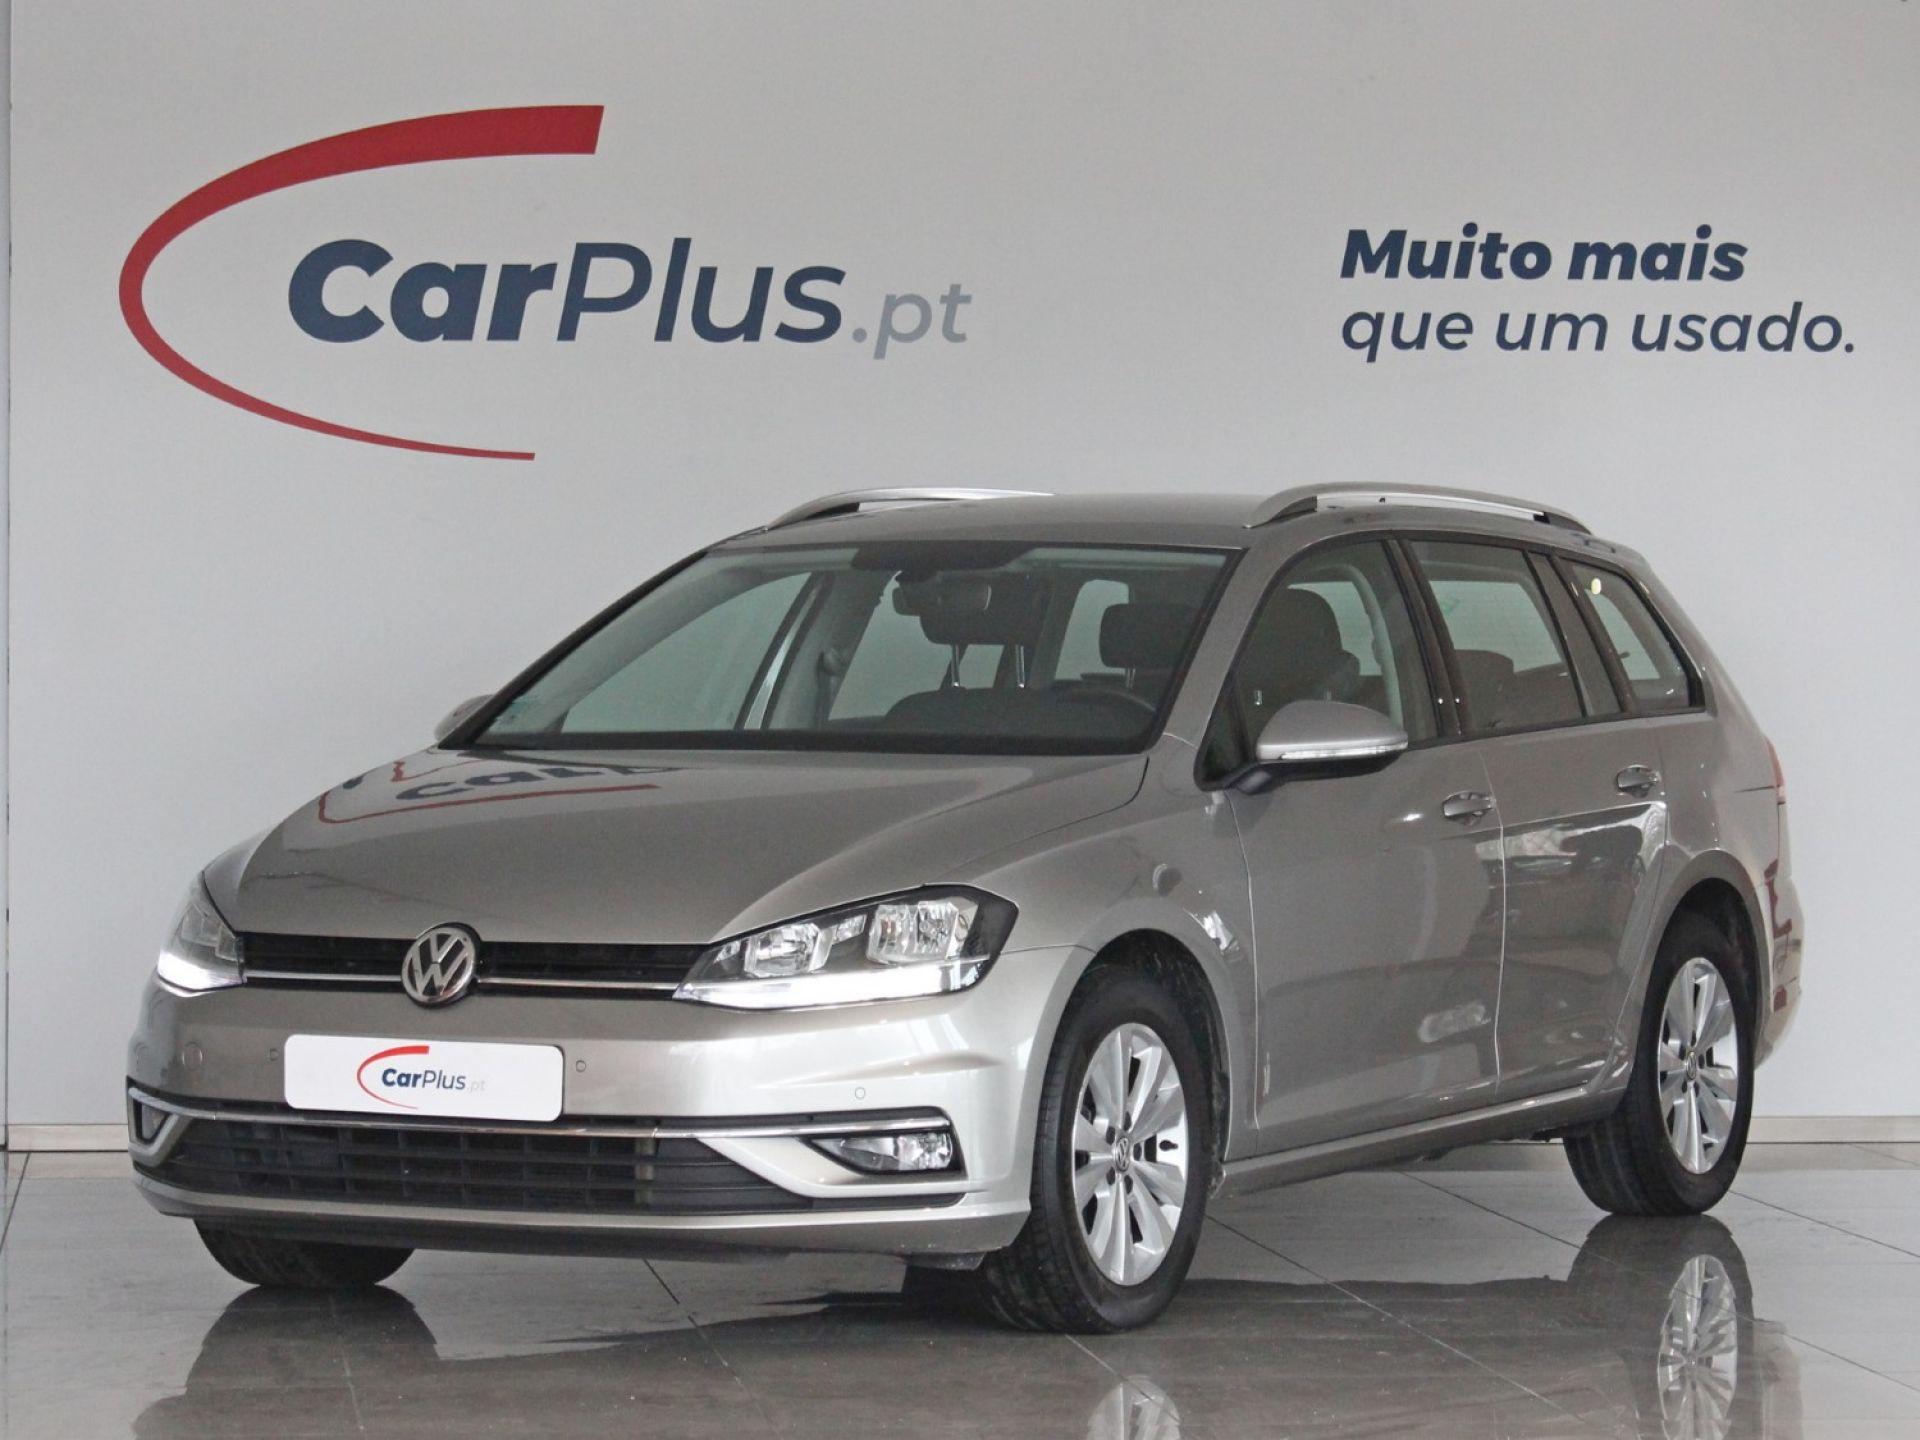 Volkswagen Golf 1.6 TDI 115cv Confortline DSG Variant segunda mão Braga